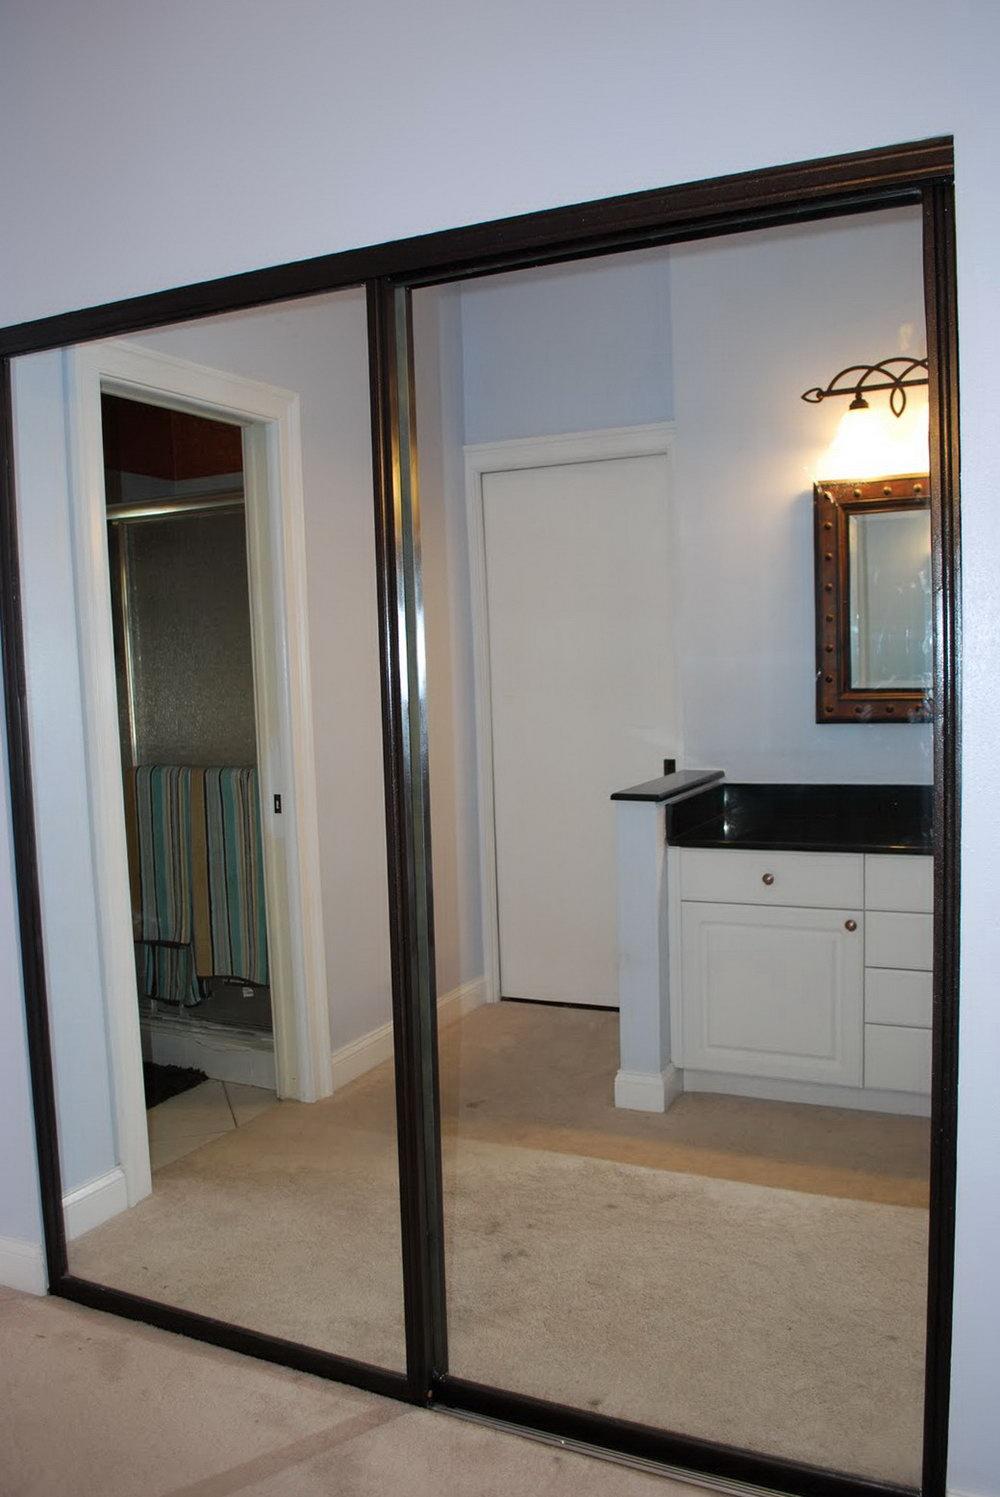 Mirror Doors For Closet Home Depot